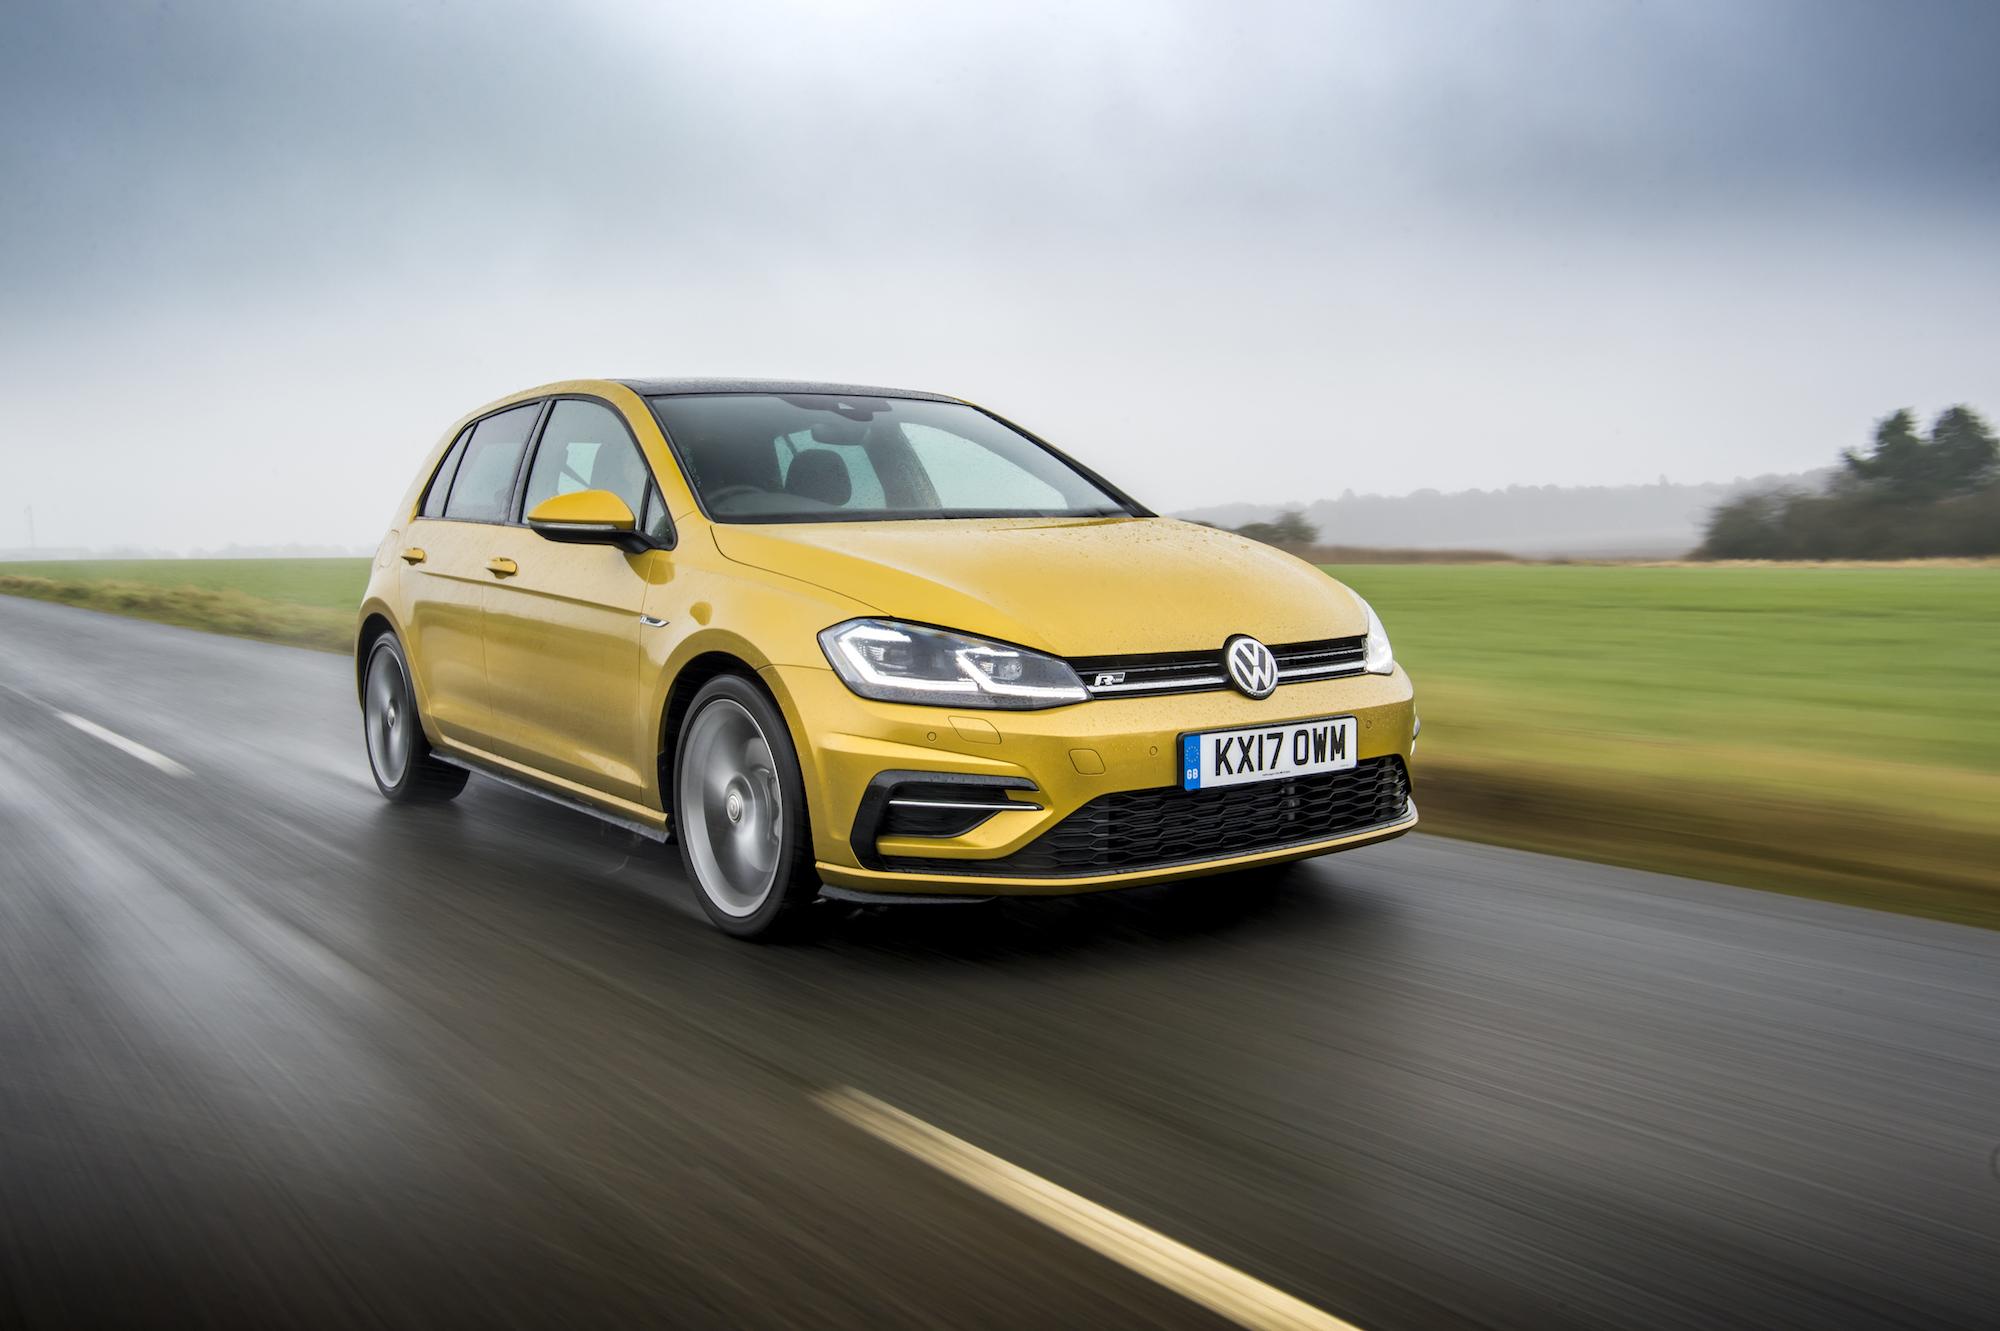 Next-gen Volkswagen Golf will include innovative new mild-hybrid systems